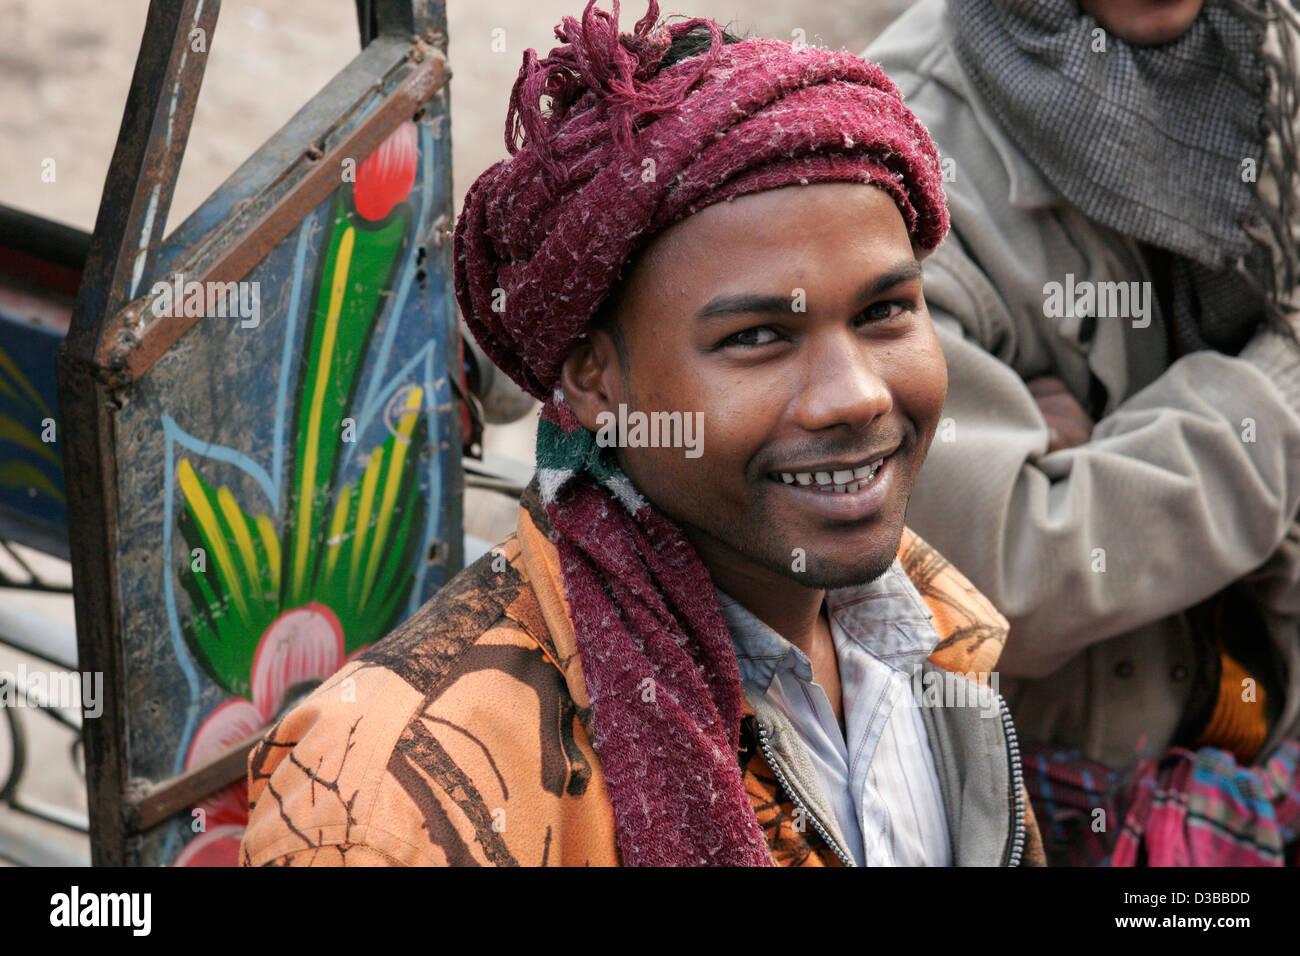 Young Bangladeshi man smiling, Bangladesh - Stock Image